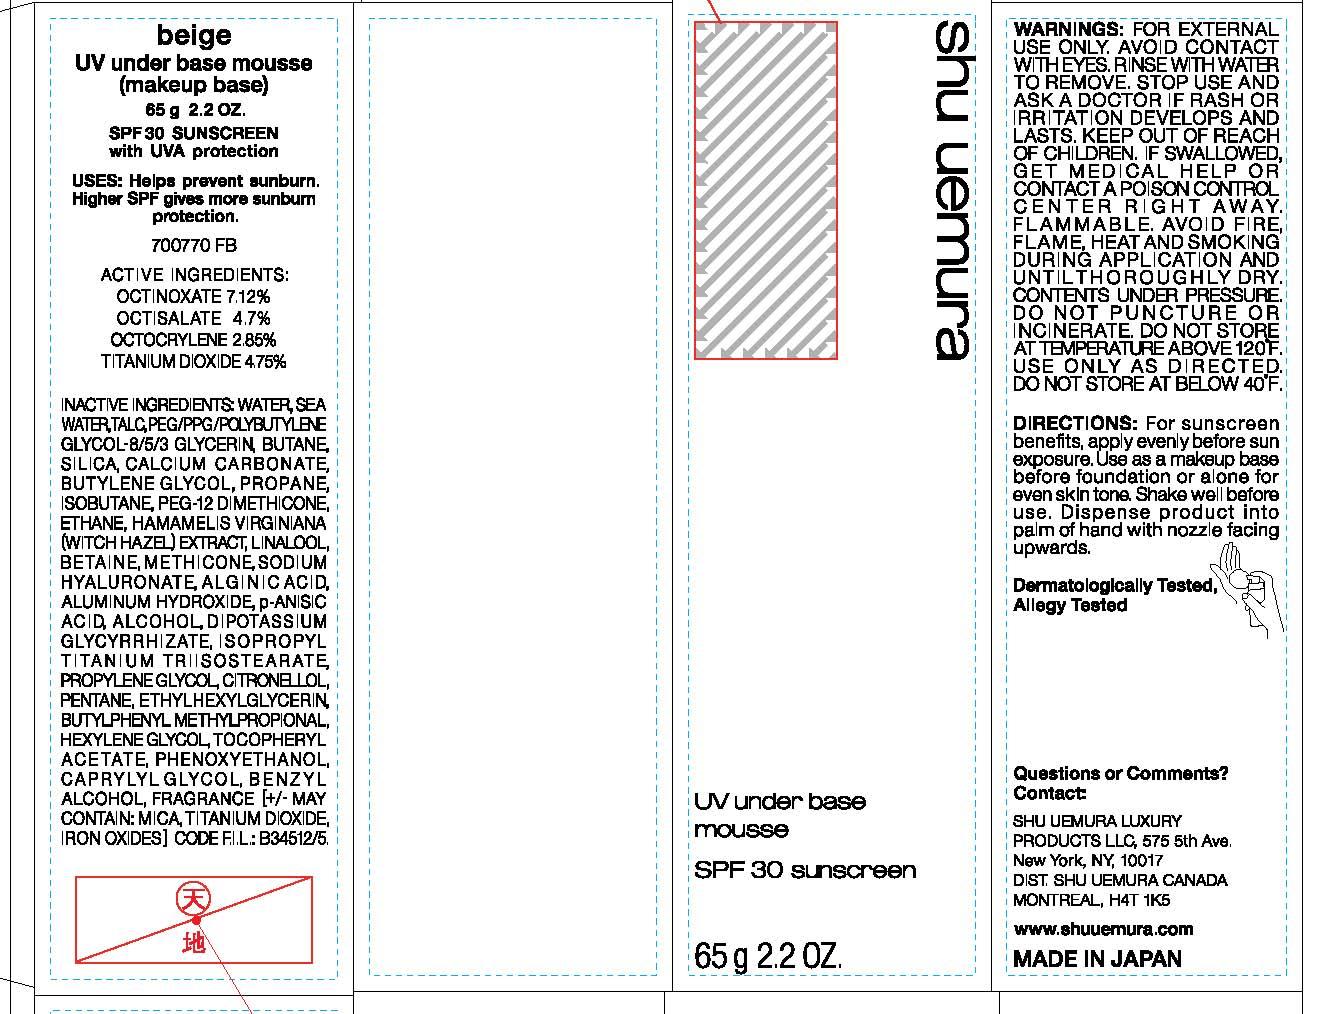 Shu Uemura Uv Under Base Mousse Spf 30 Sunscreen (Octinoxate Octisalate Octocrylene Titanium Dioxide) Aerosol, Foam [Cosmelor Ltd]